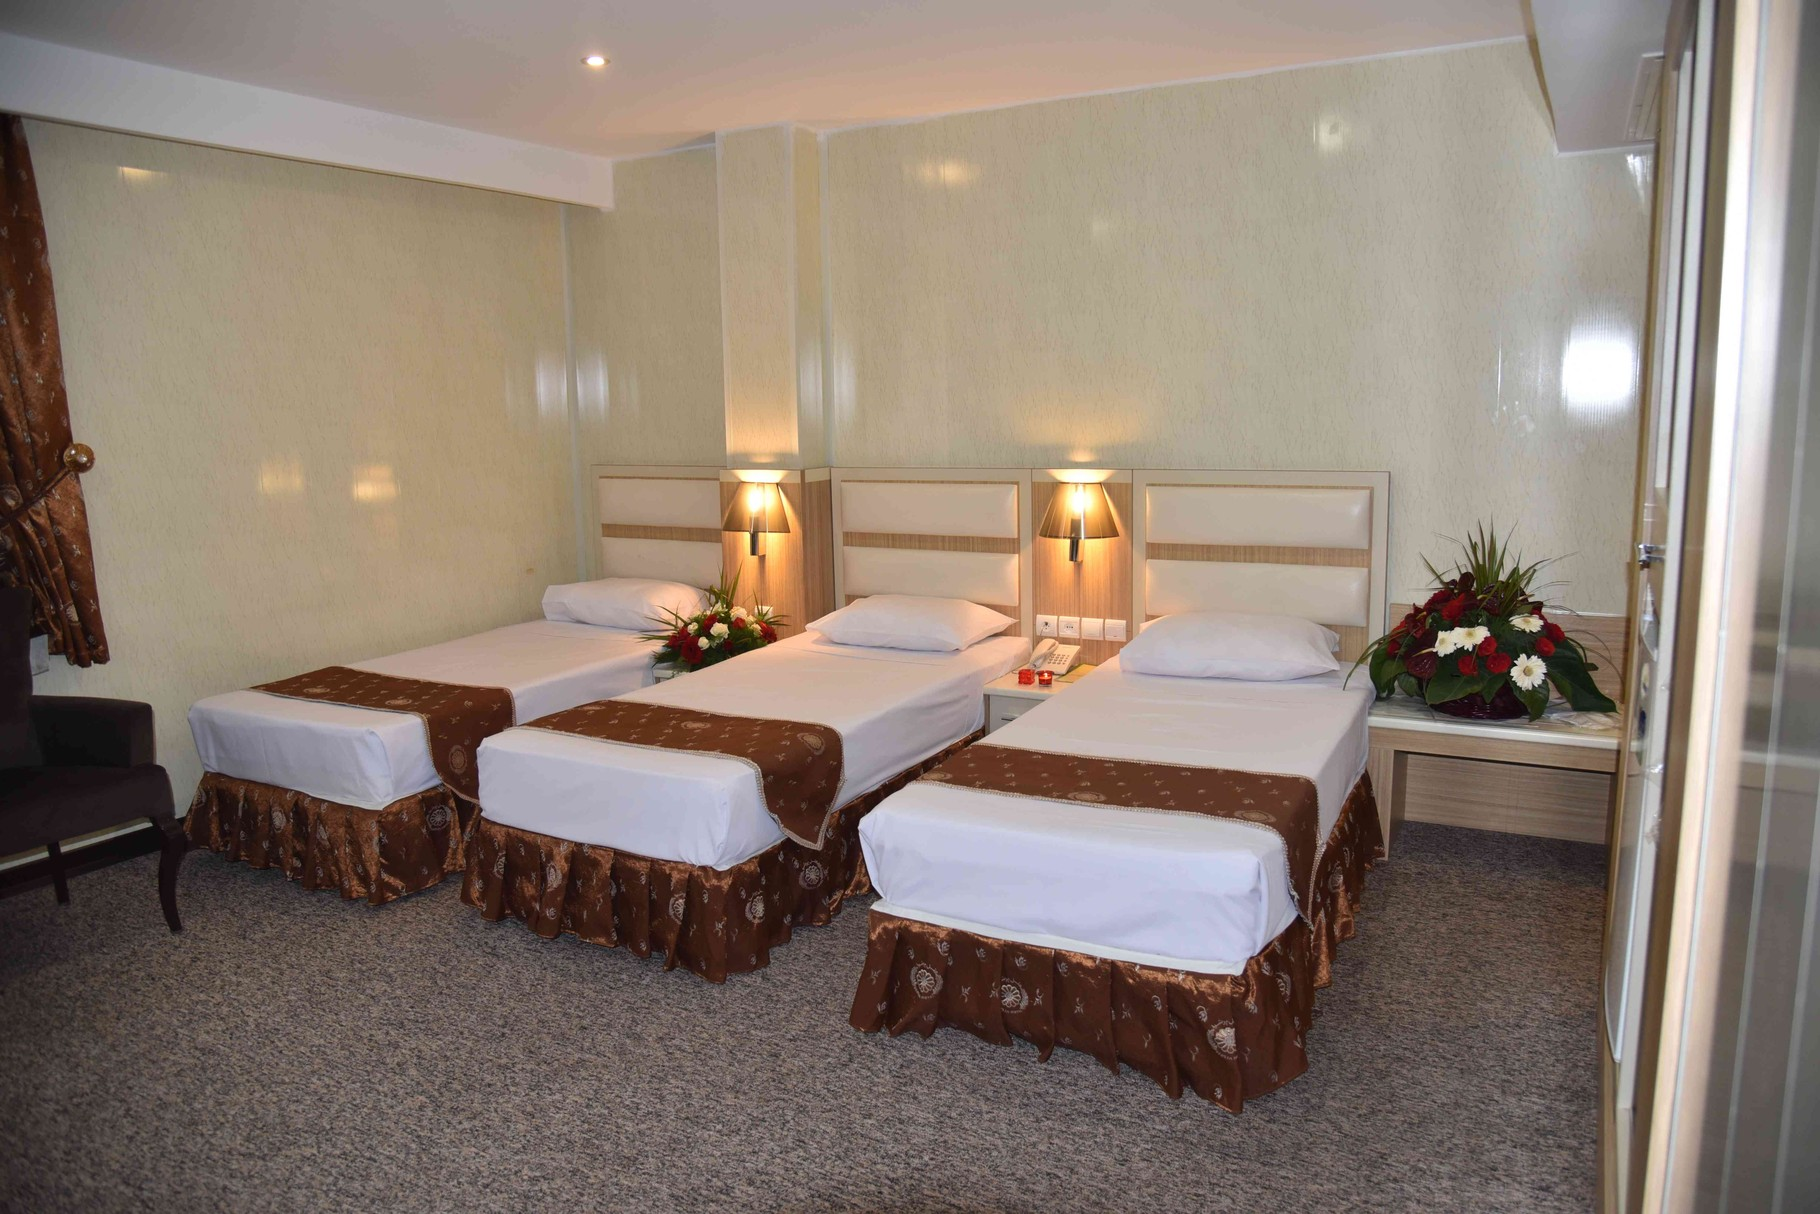 Hotel Persia